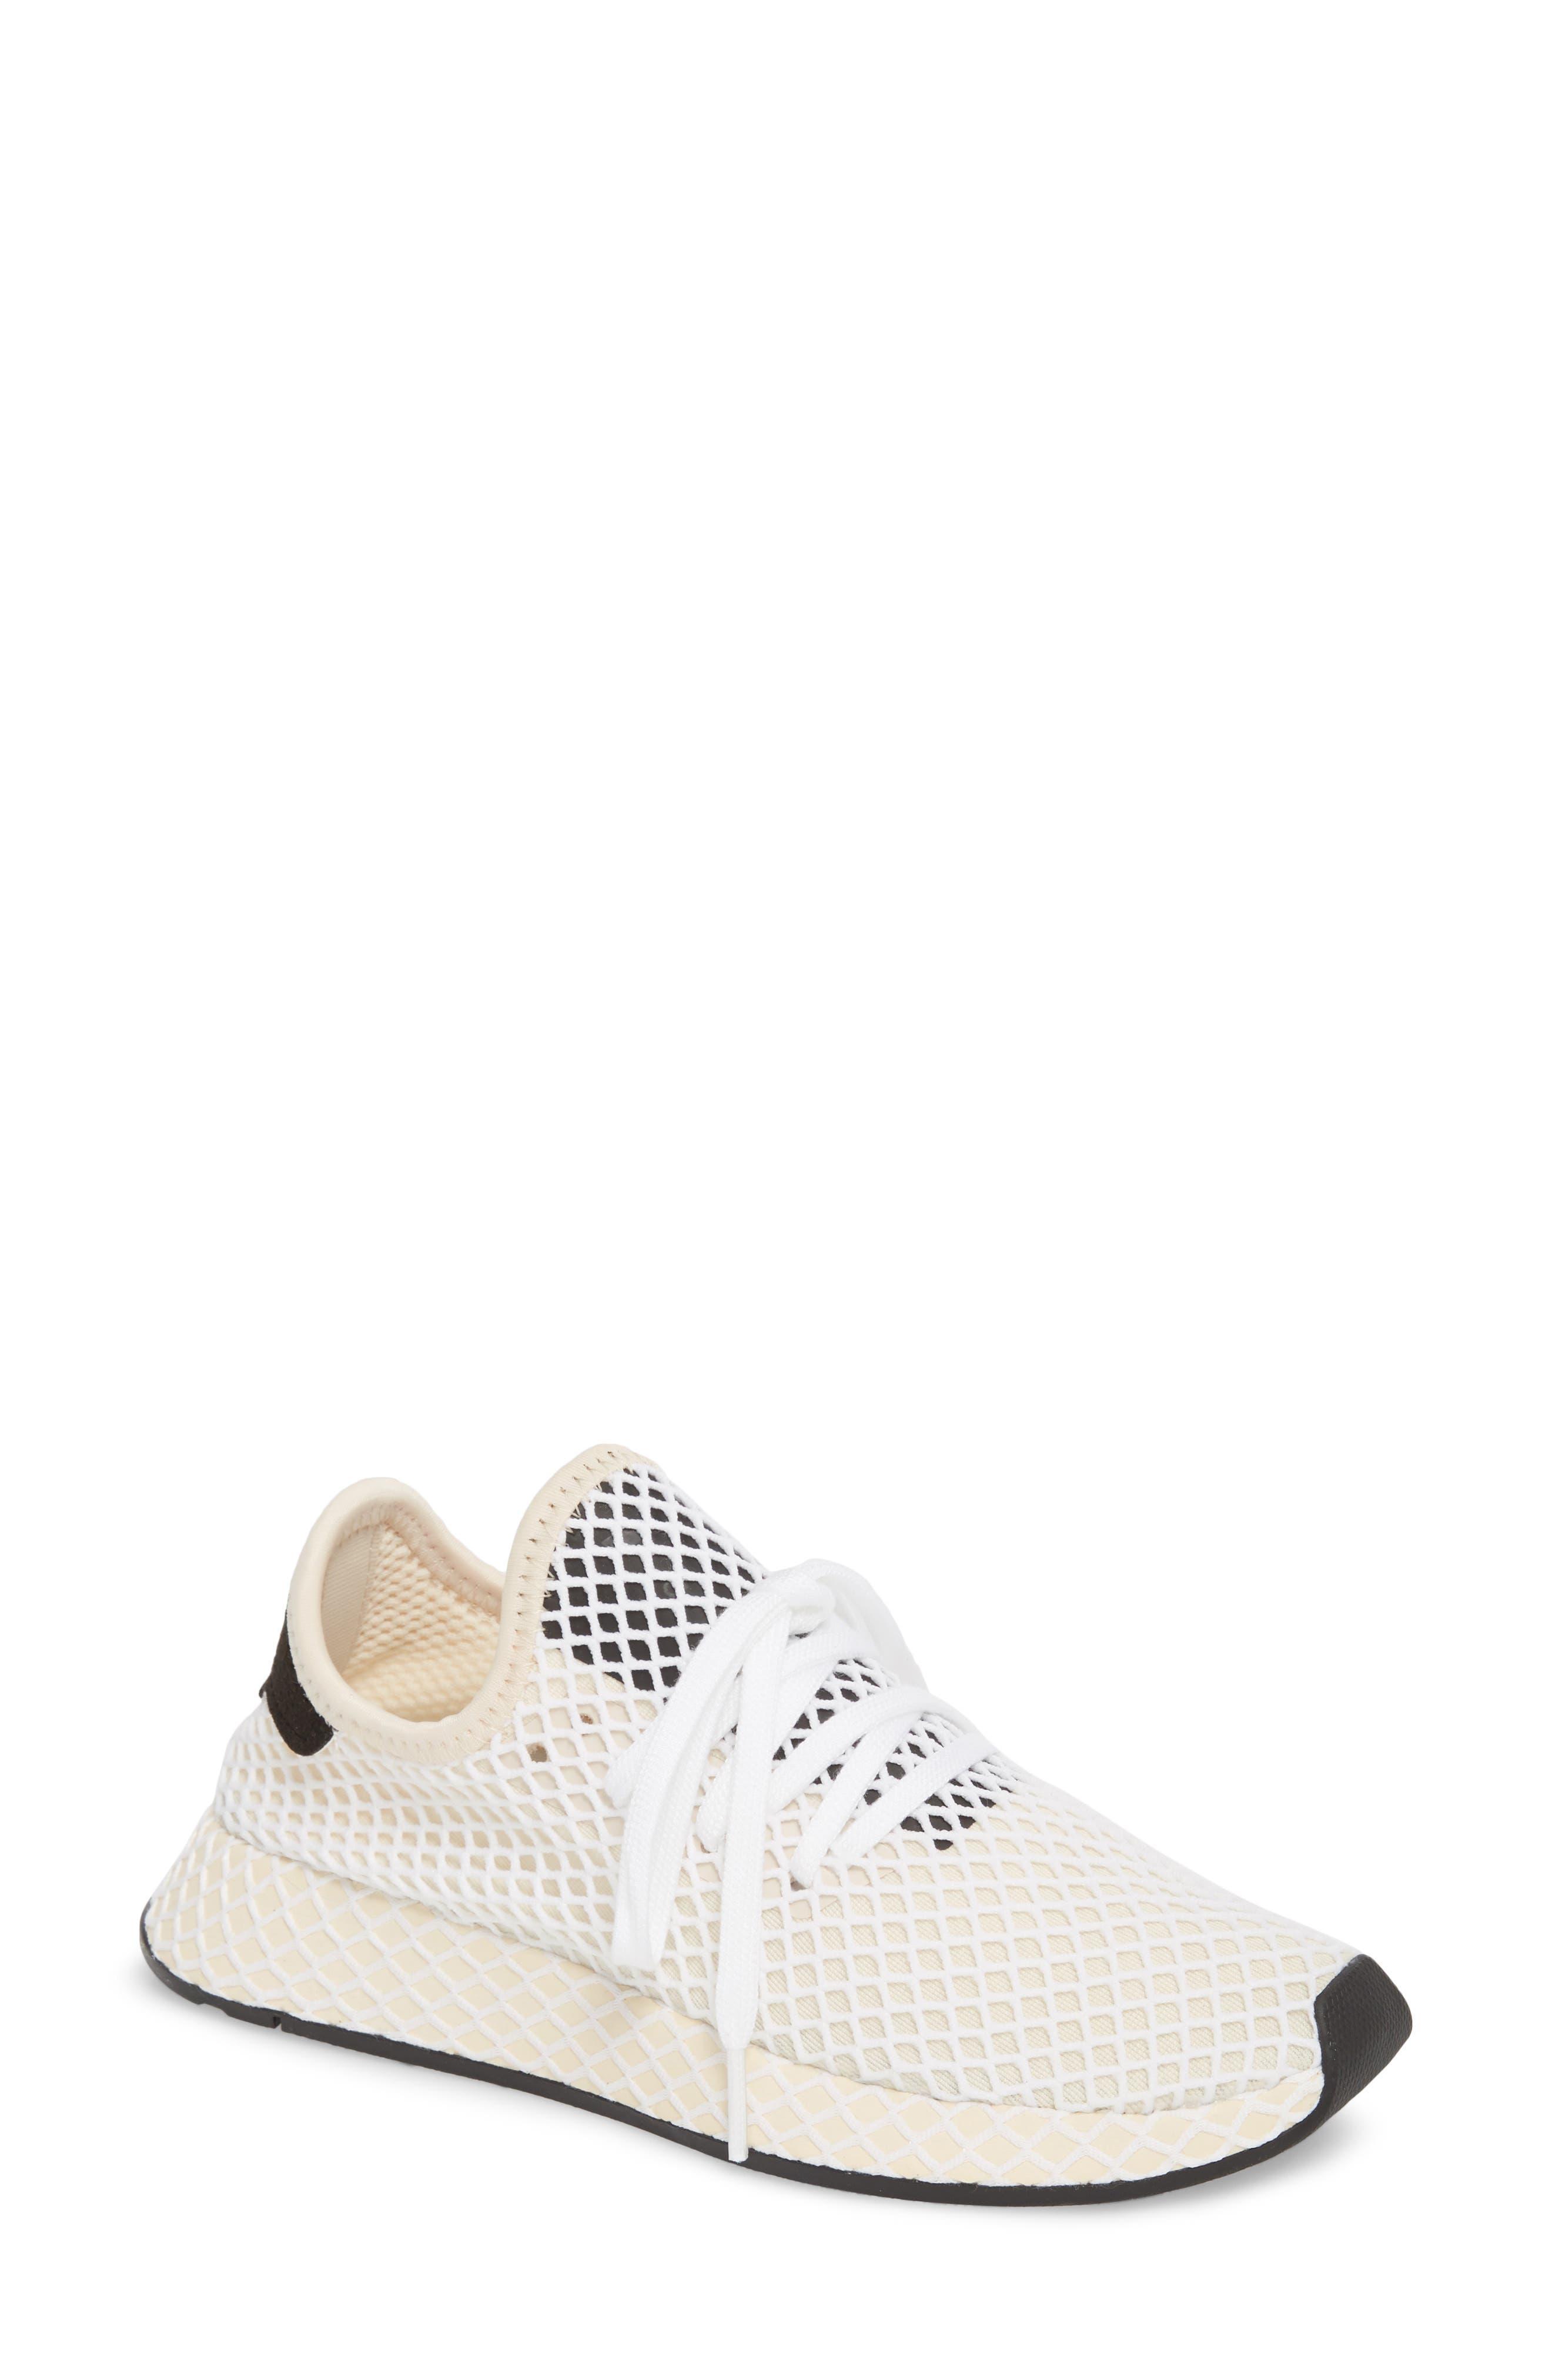 Deerupt Runner Sneaker,                         Main,                         color, Linen/ Linen/ Ecru Tint